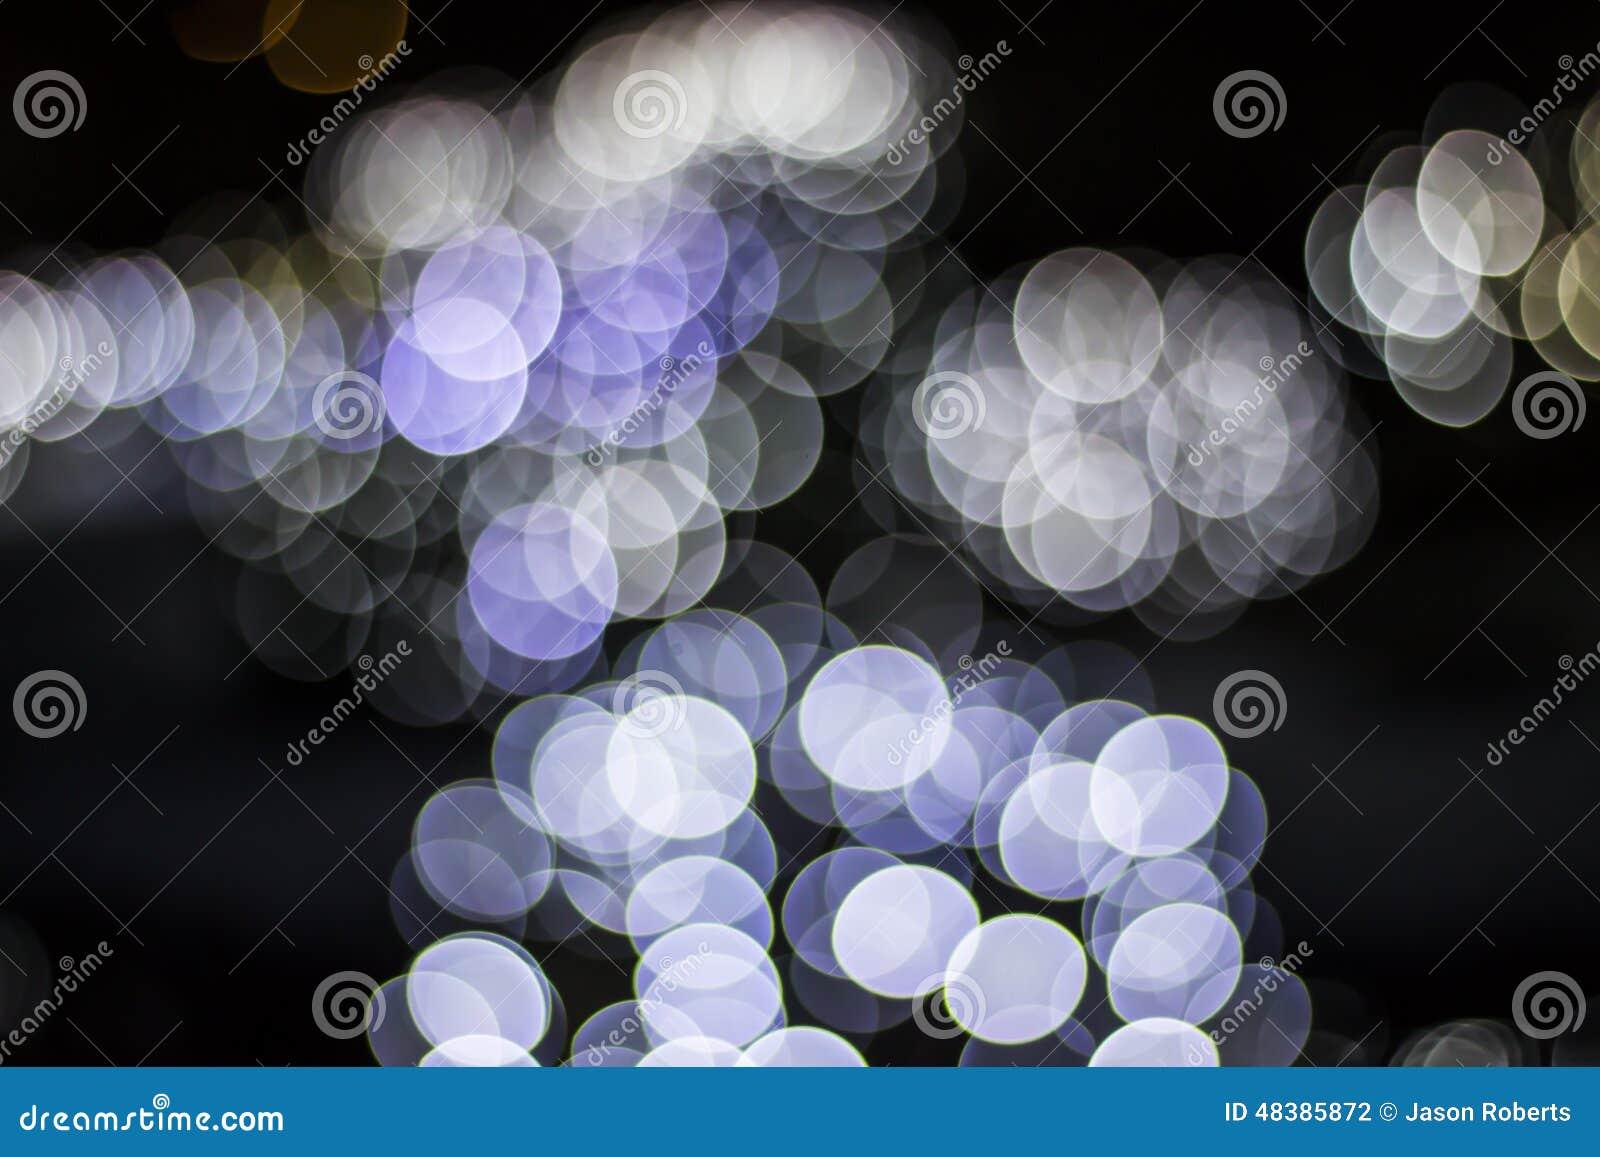 Bokeh of Seasonal Lights